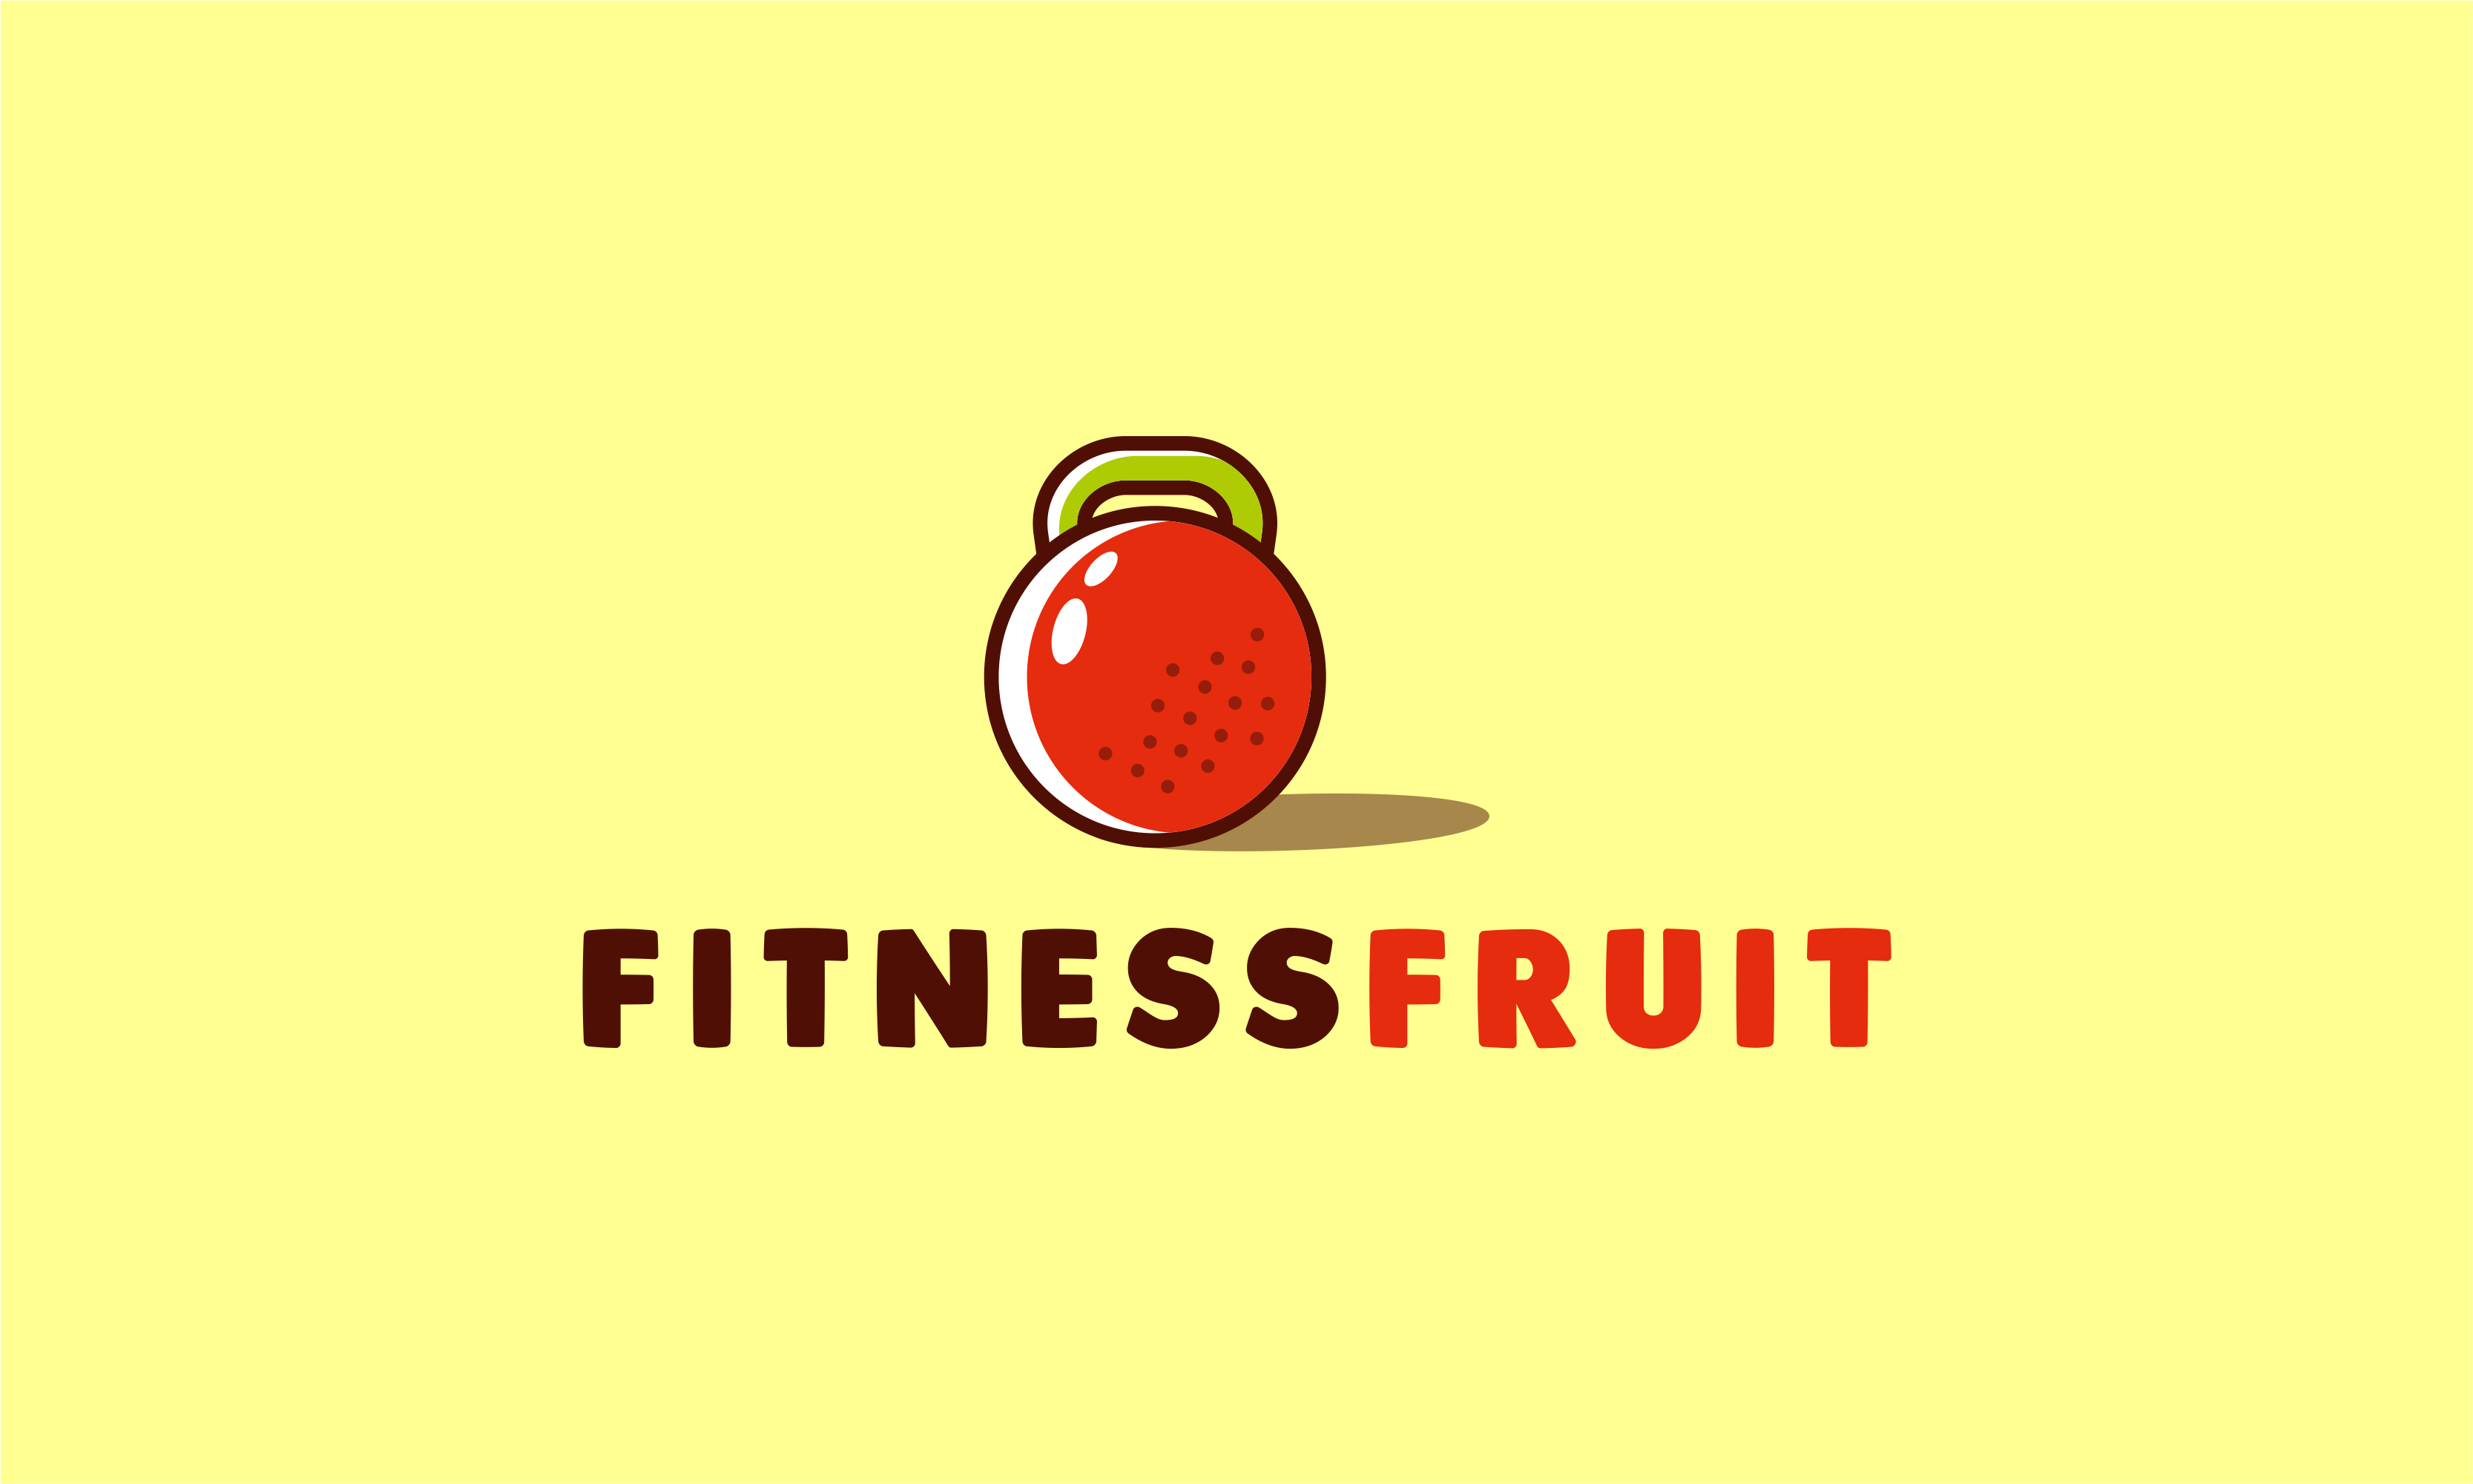 Fitnessfruit